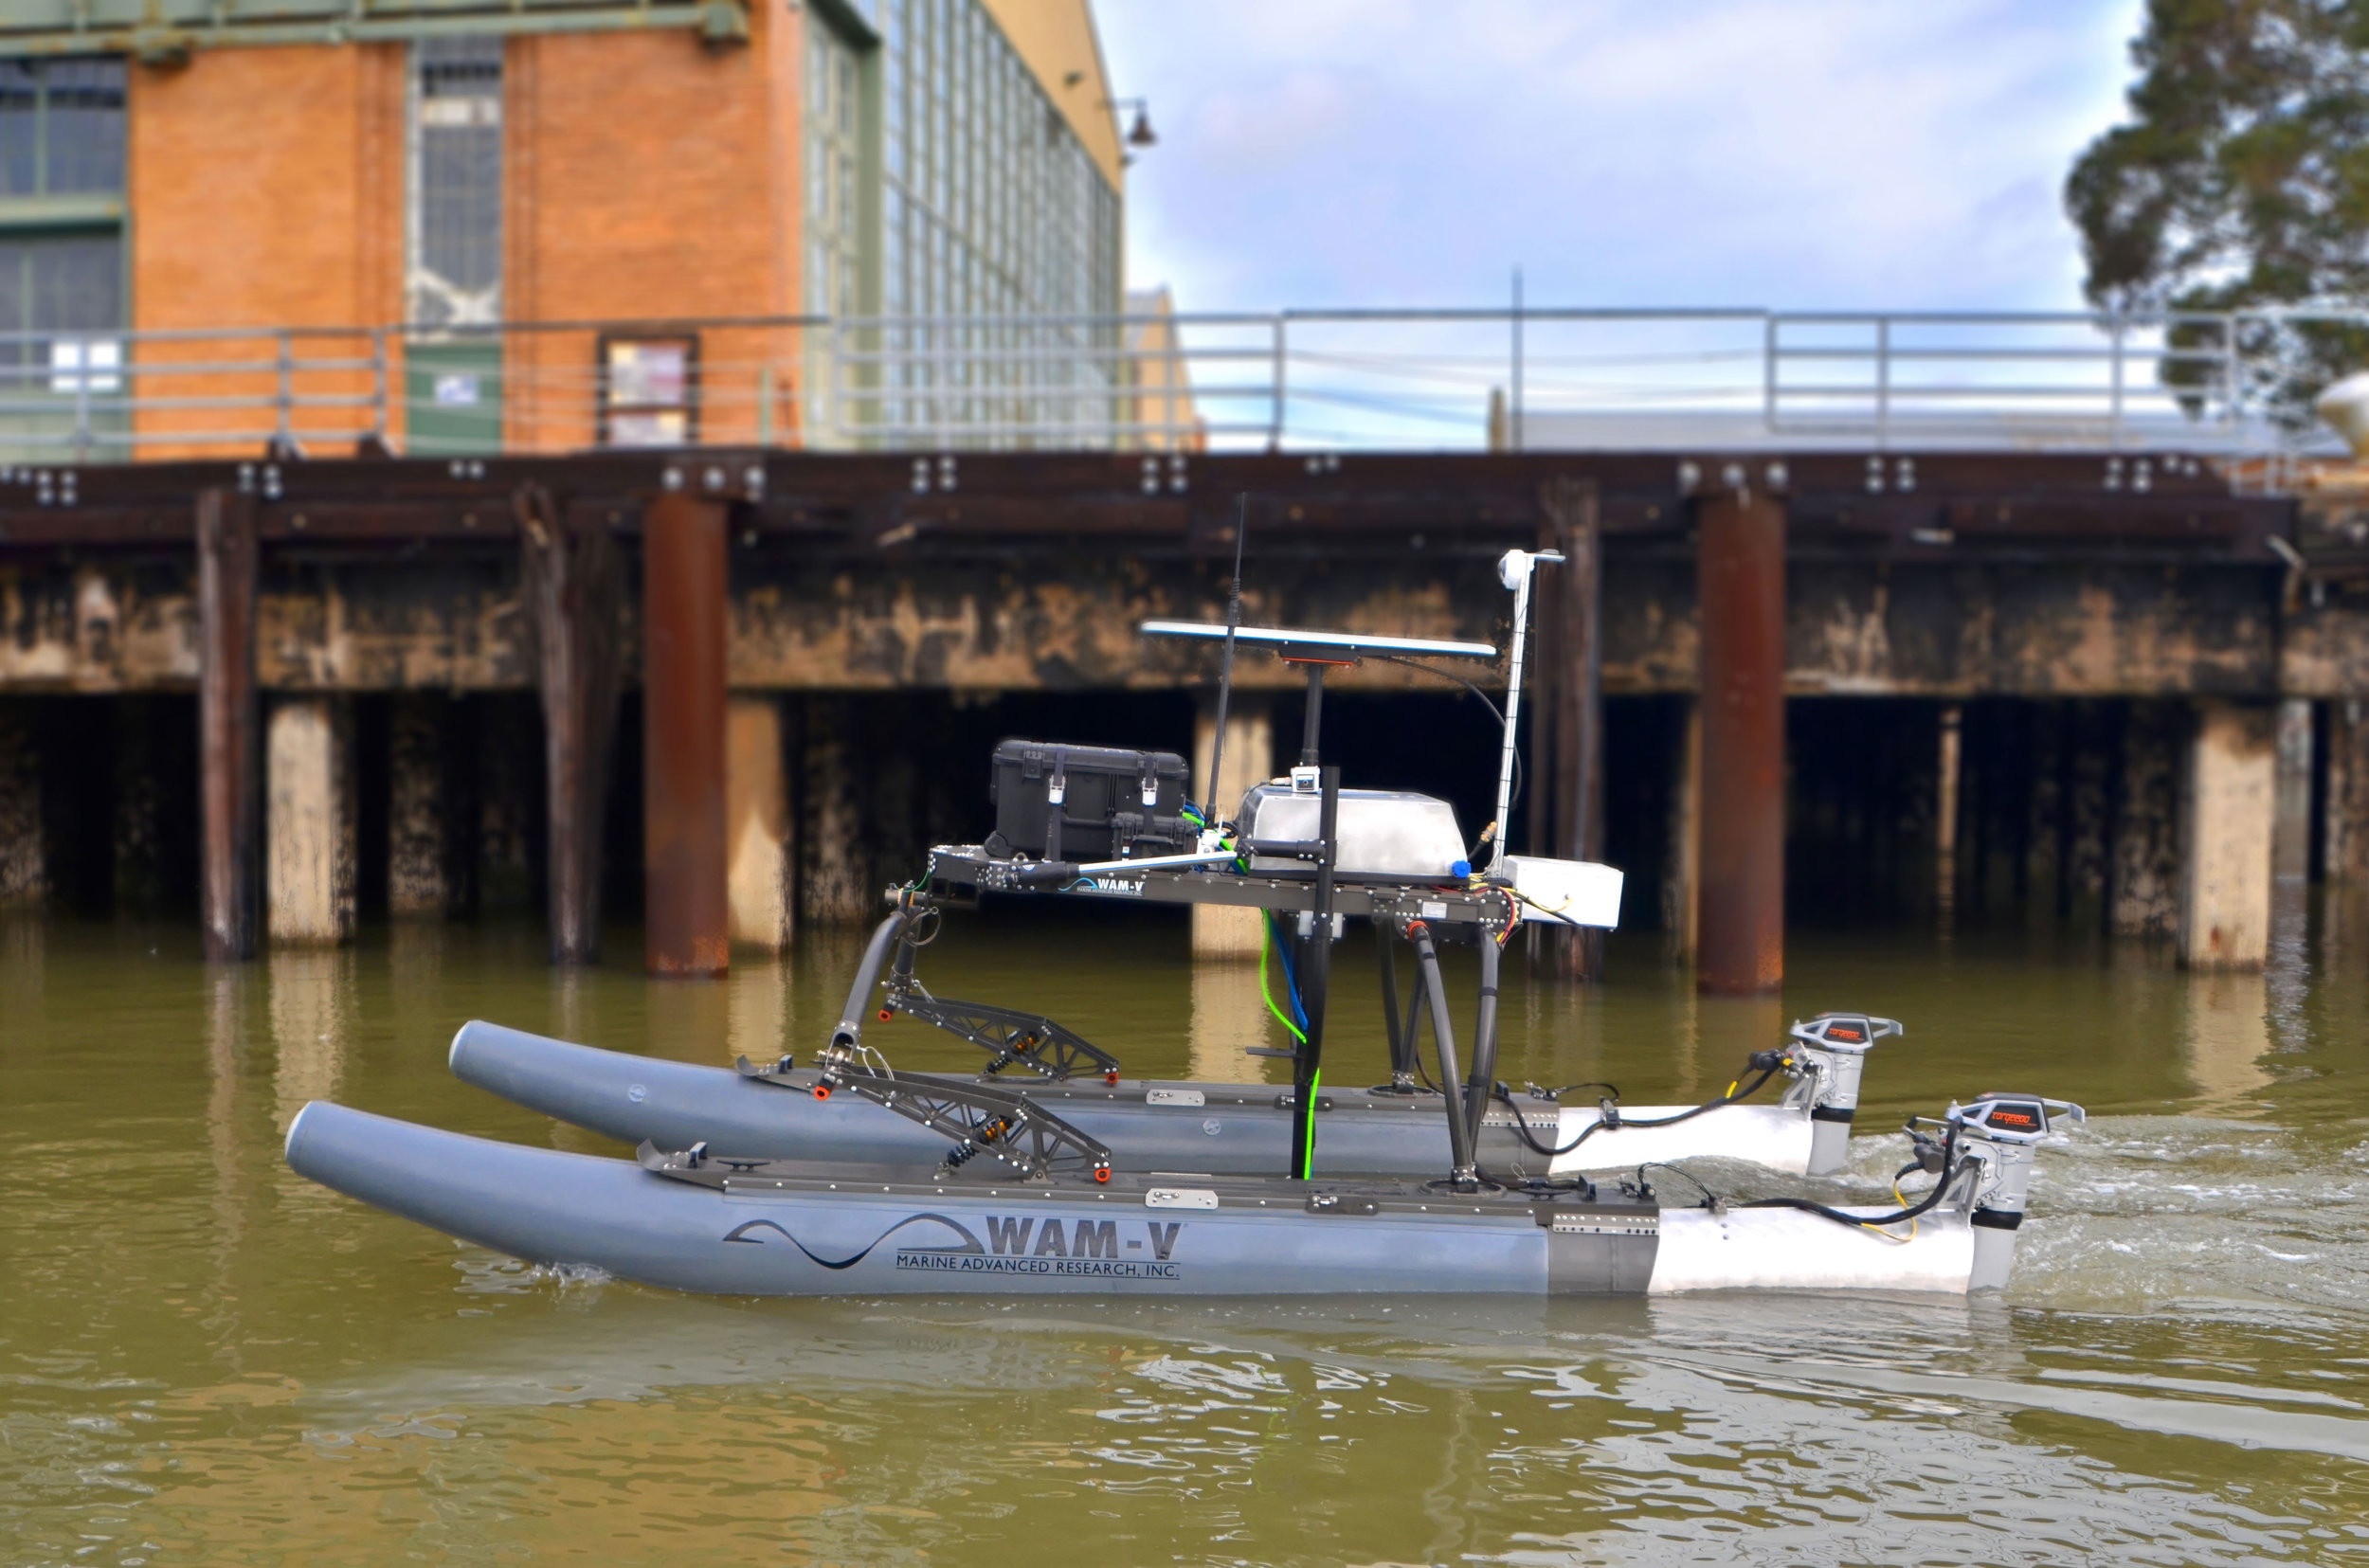 WAM-V 16 ASV for Hydrographic Survey